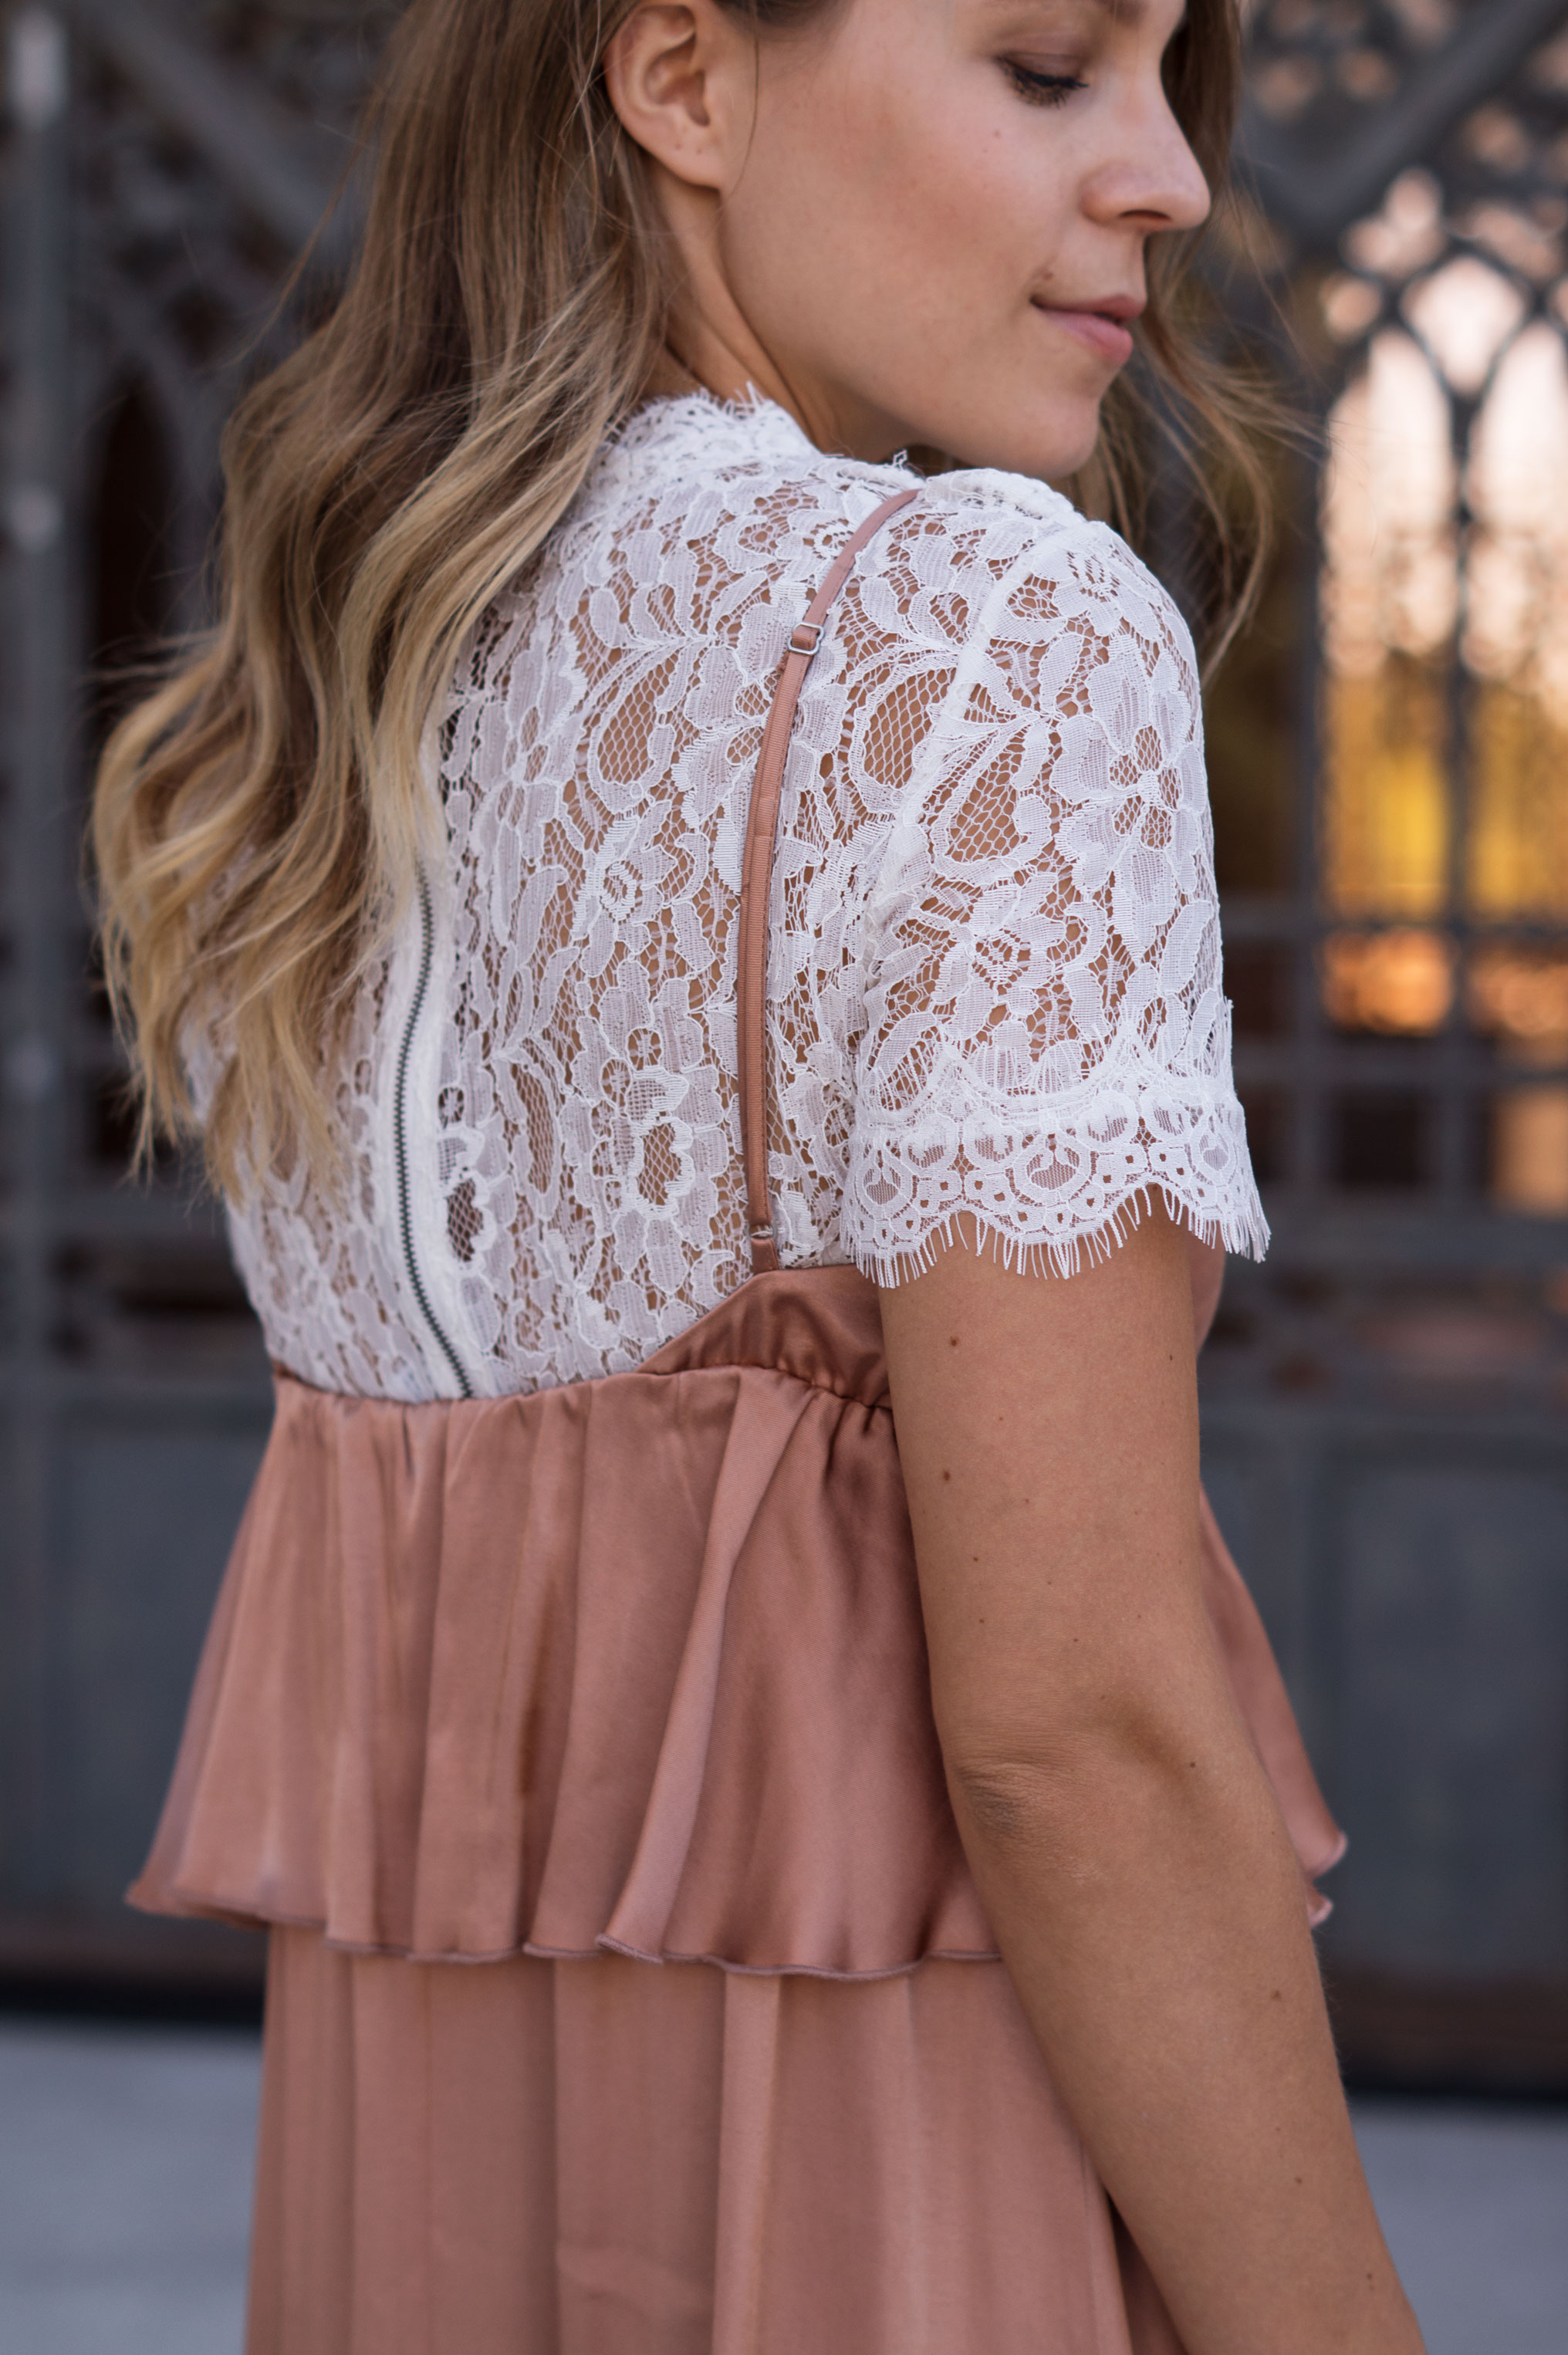 Copper Slipdress rosa Satinkleid silk dress ruffles Rüschenkleid H&M Sariety Modeblog Heidelberg Fashionblogger Milan Mailand Shooting-23